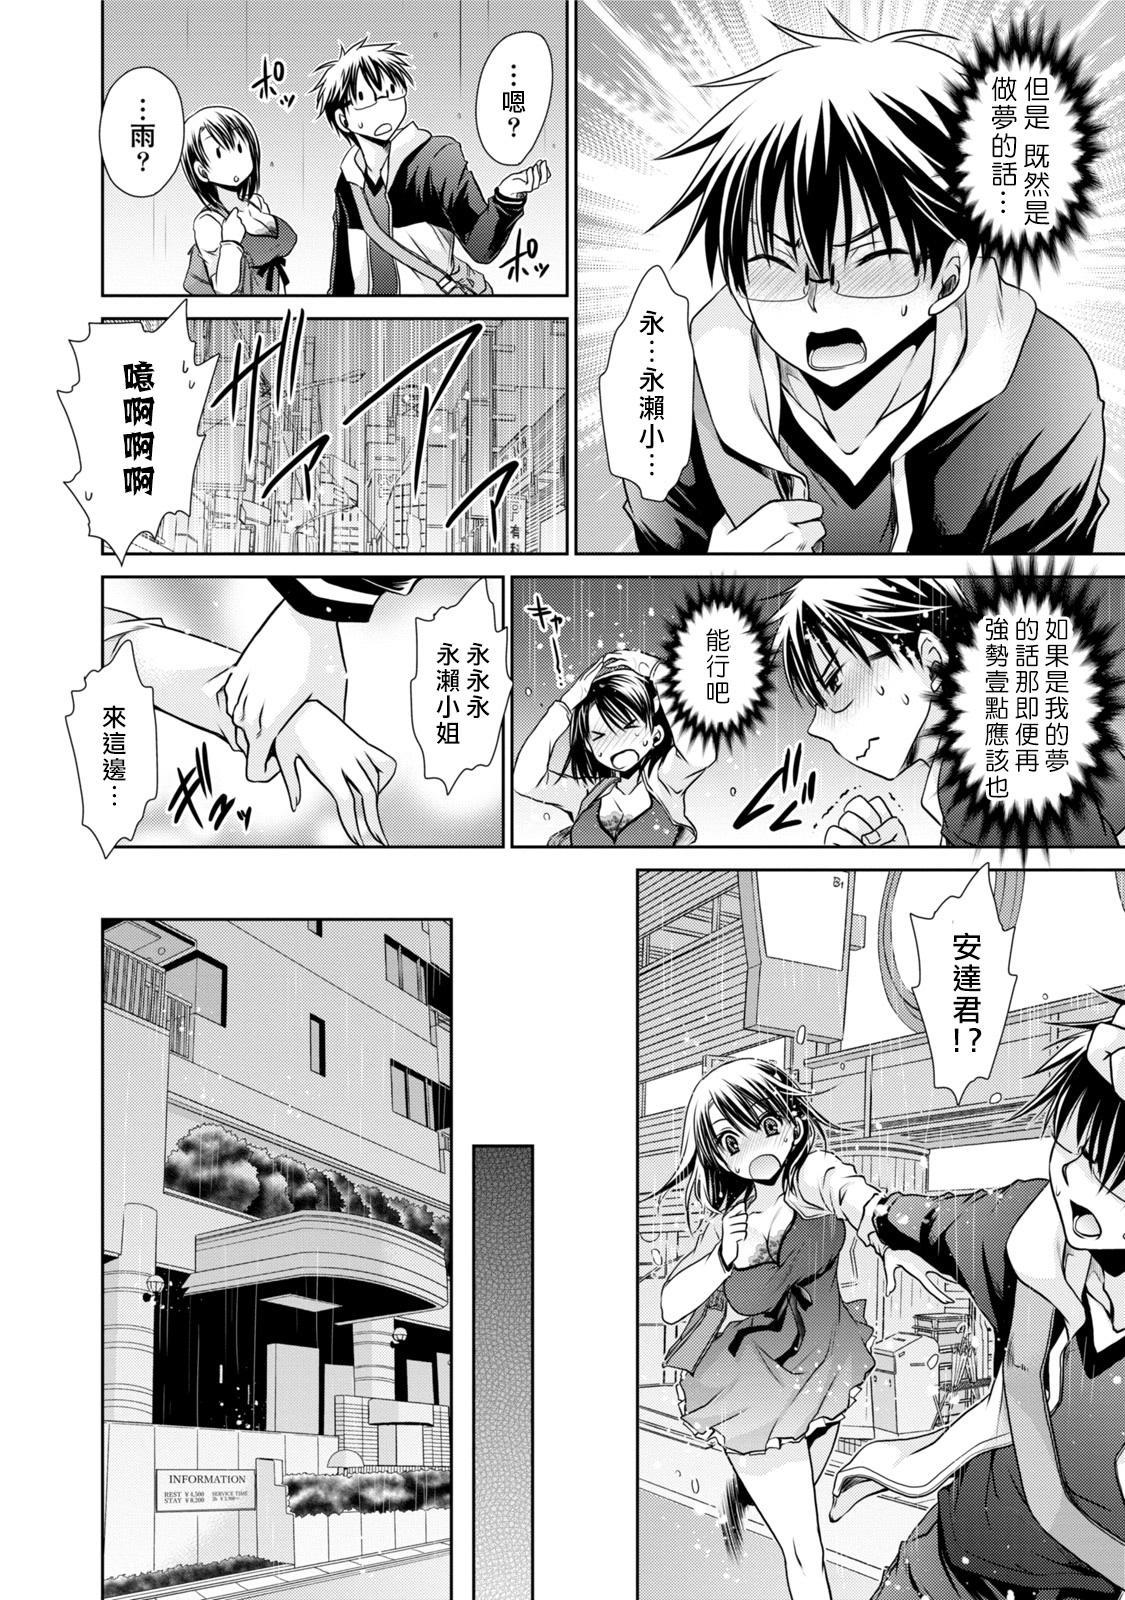 [Shinonome Ryu] Ore to Kanojo to Owaru Sekai - World's end LoveStory 1-5 [Chinese] [爱弹幕汉化组] [Digital] 97